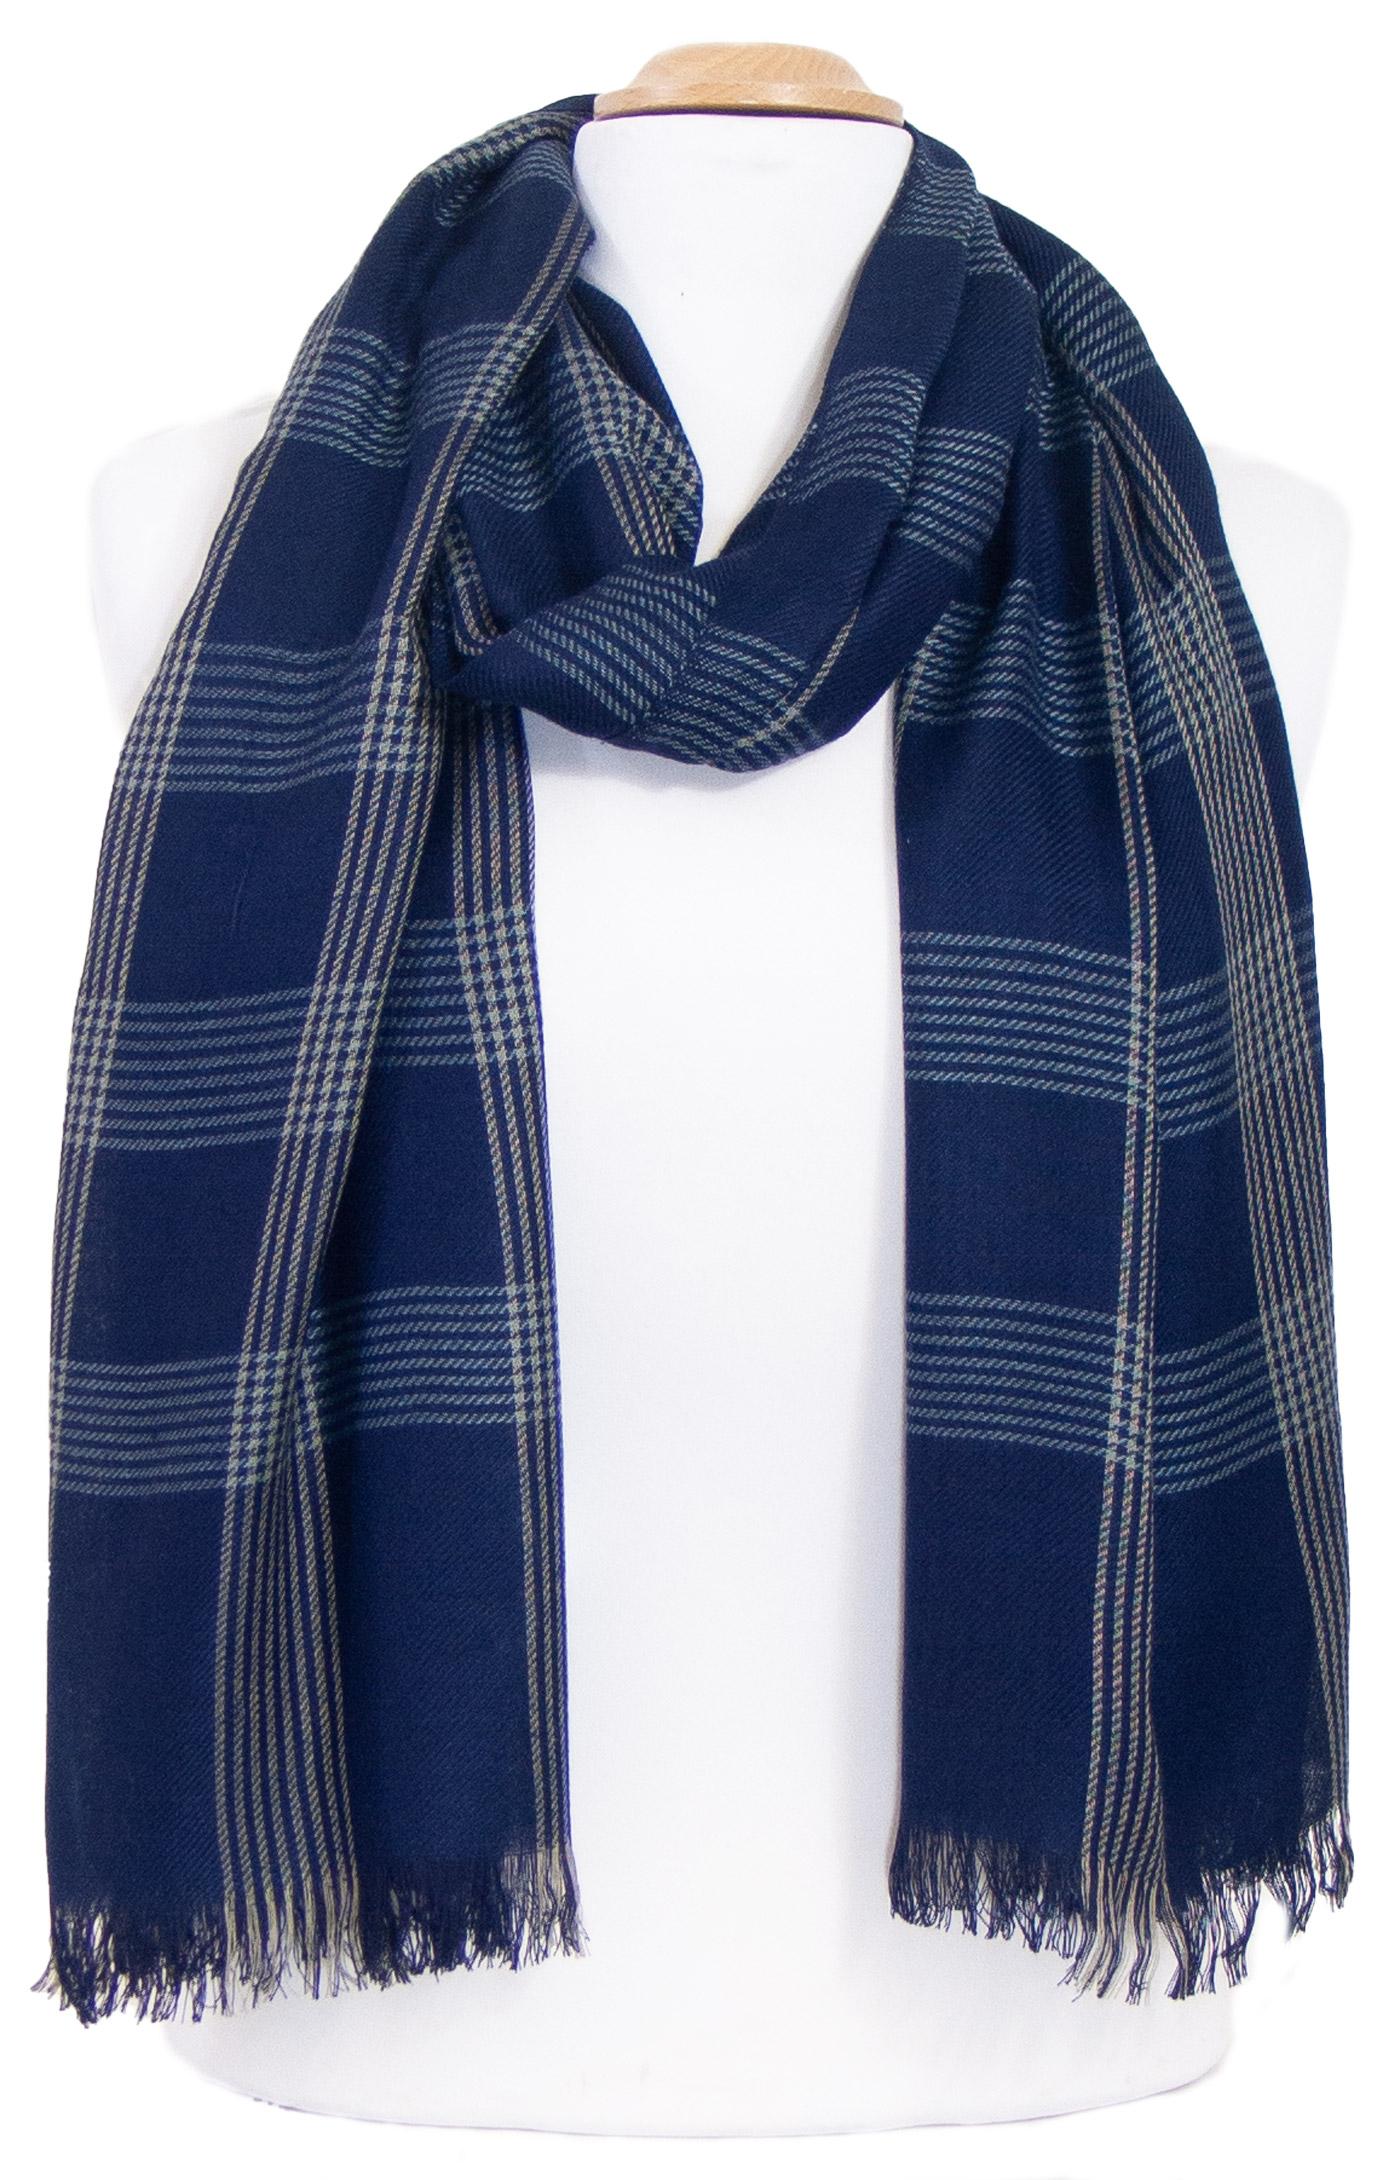 Chèche foulard homme bleu marine carreaux